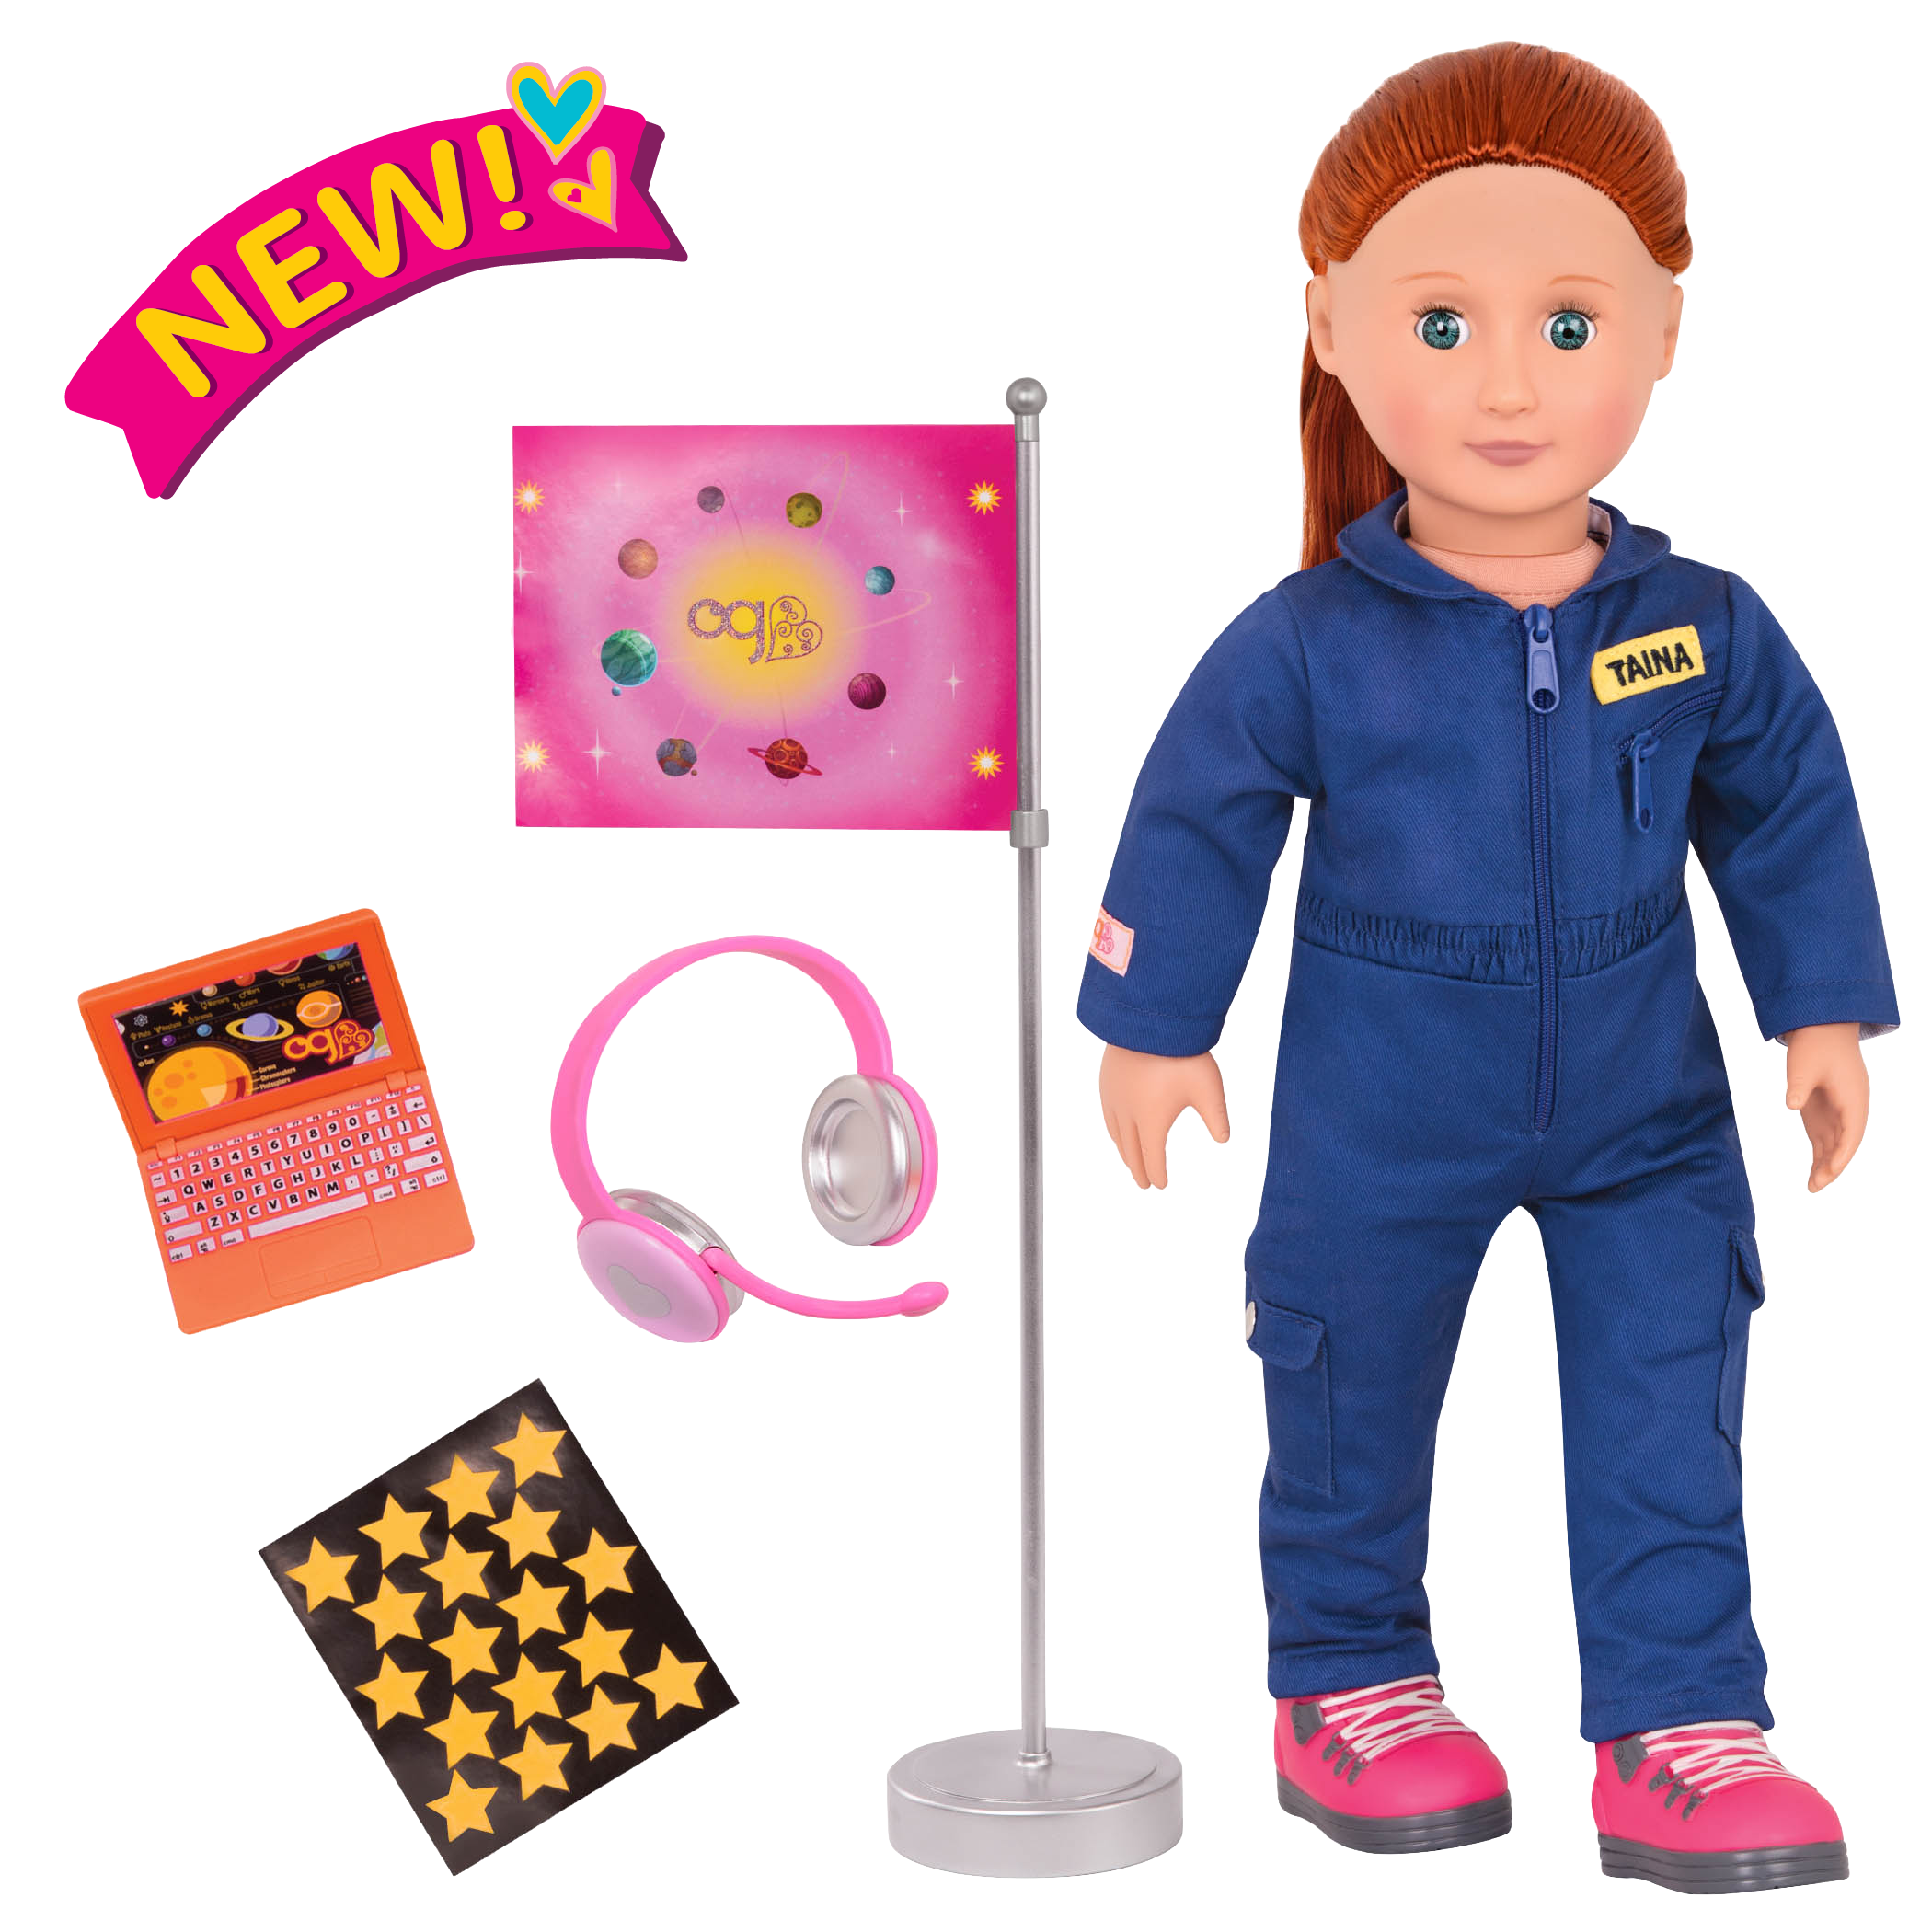 Taina 18-inch Astronaut Doll